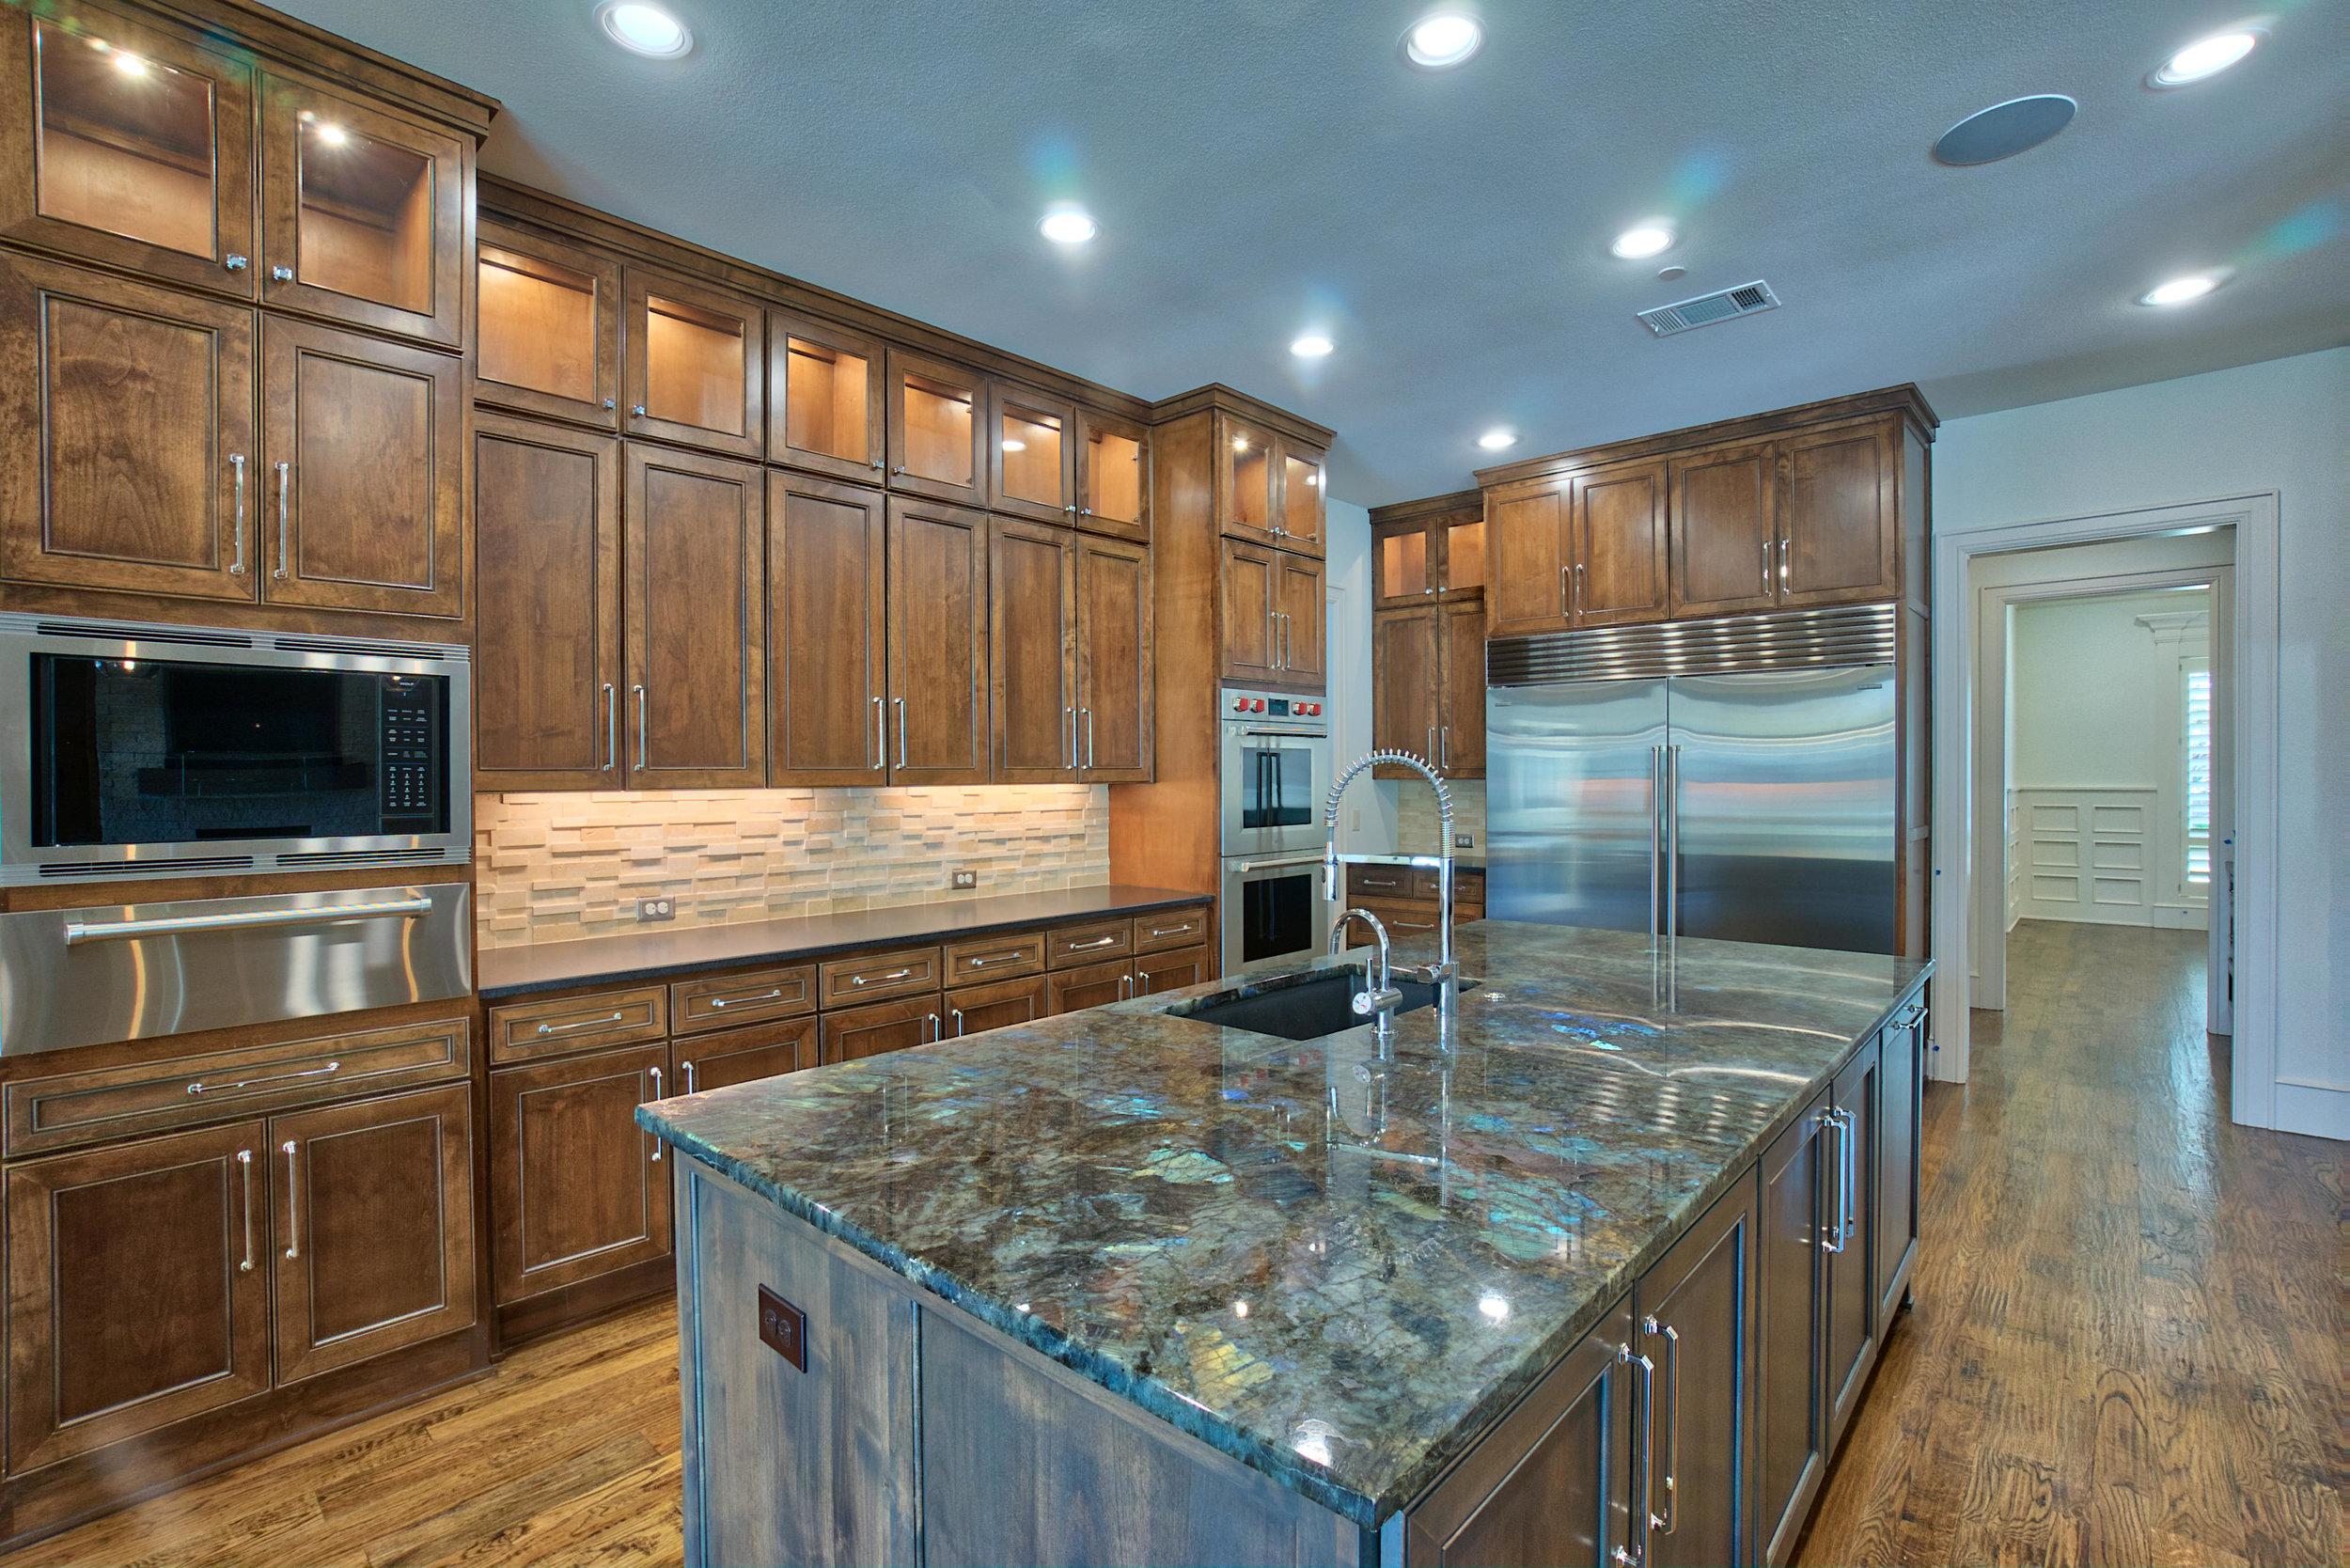 10 Kitchen 3.jpeg